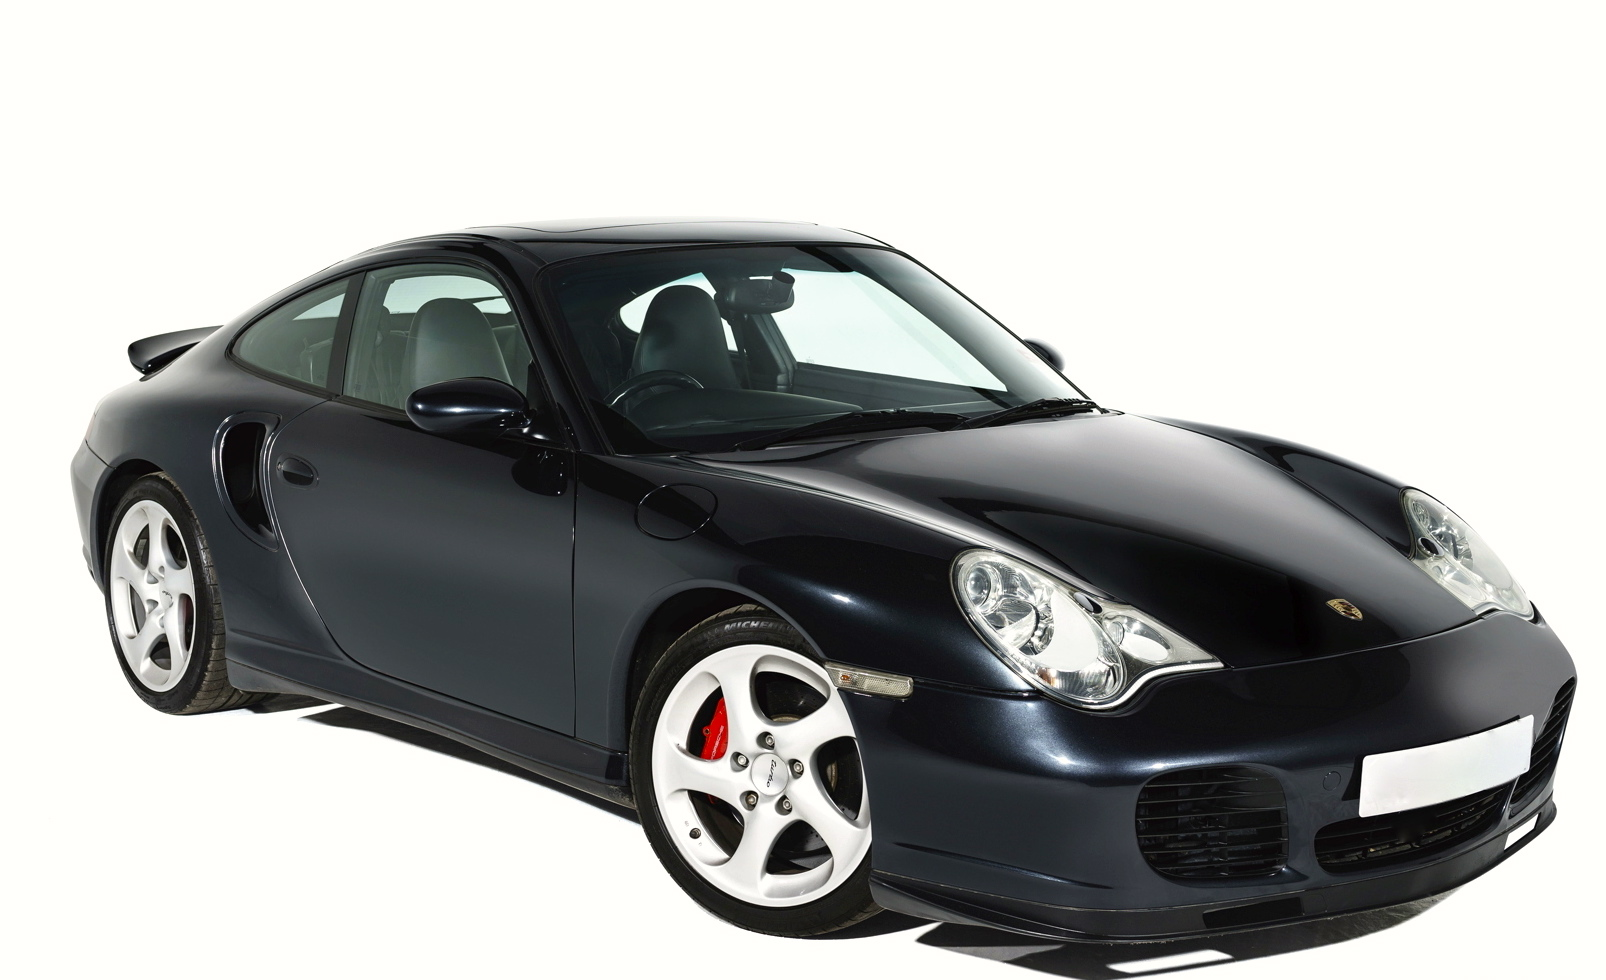 Porsche-996-Turbo